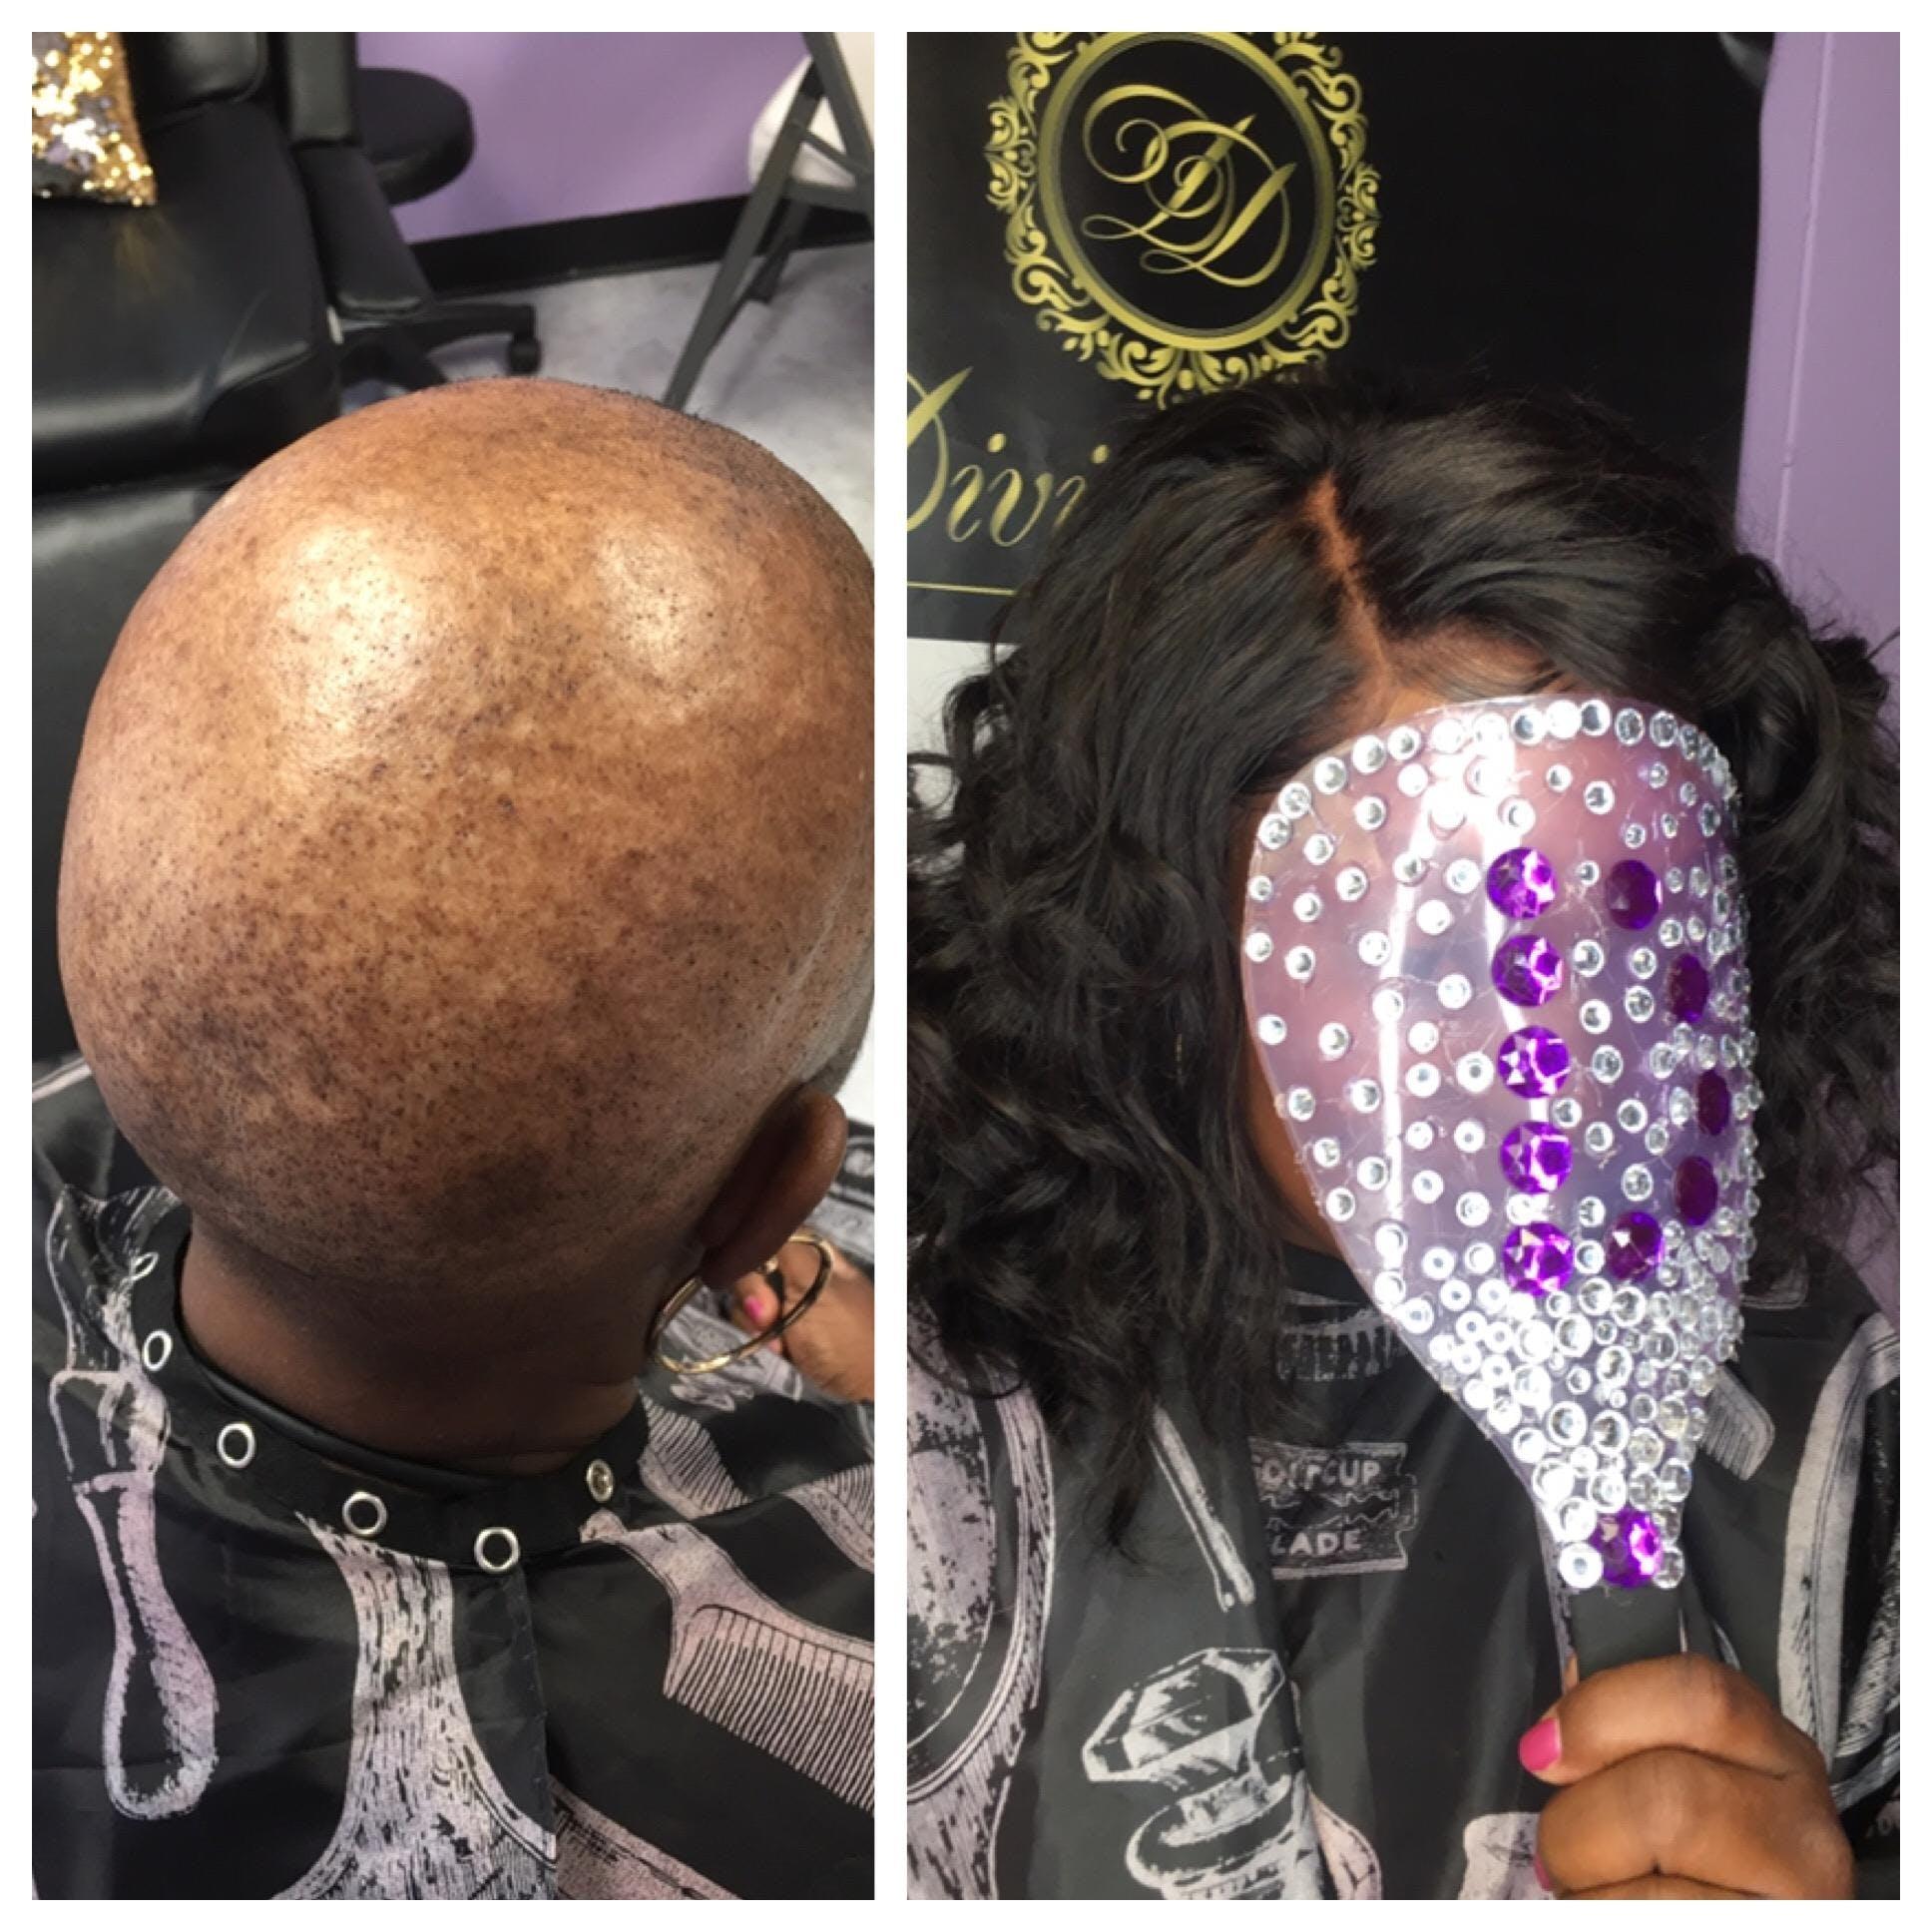 Hair Loss Alopecia Cranial Wig Prosthesis for Veterans